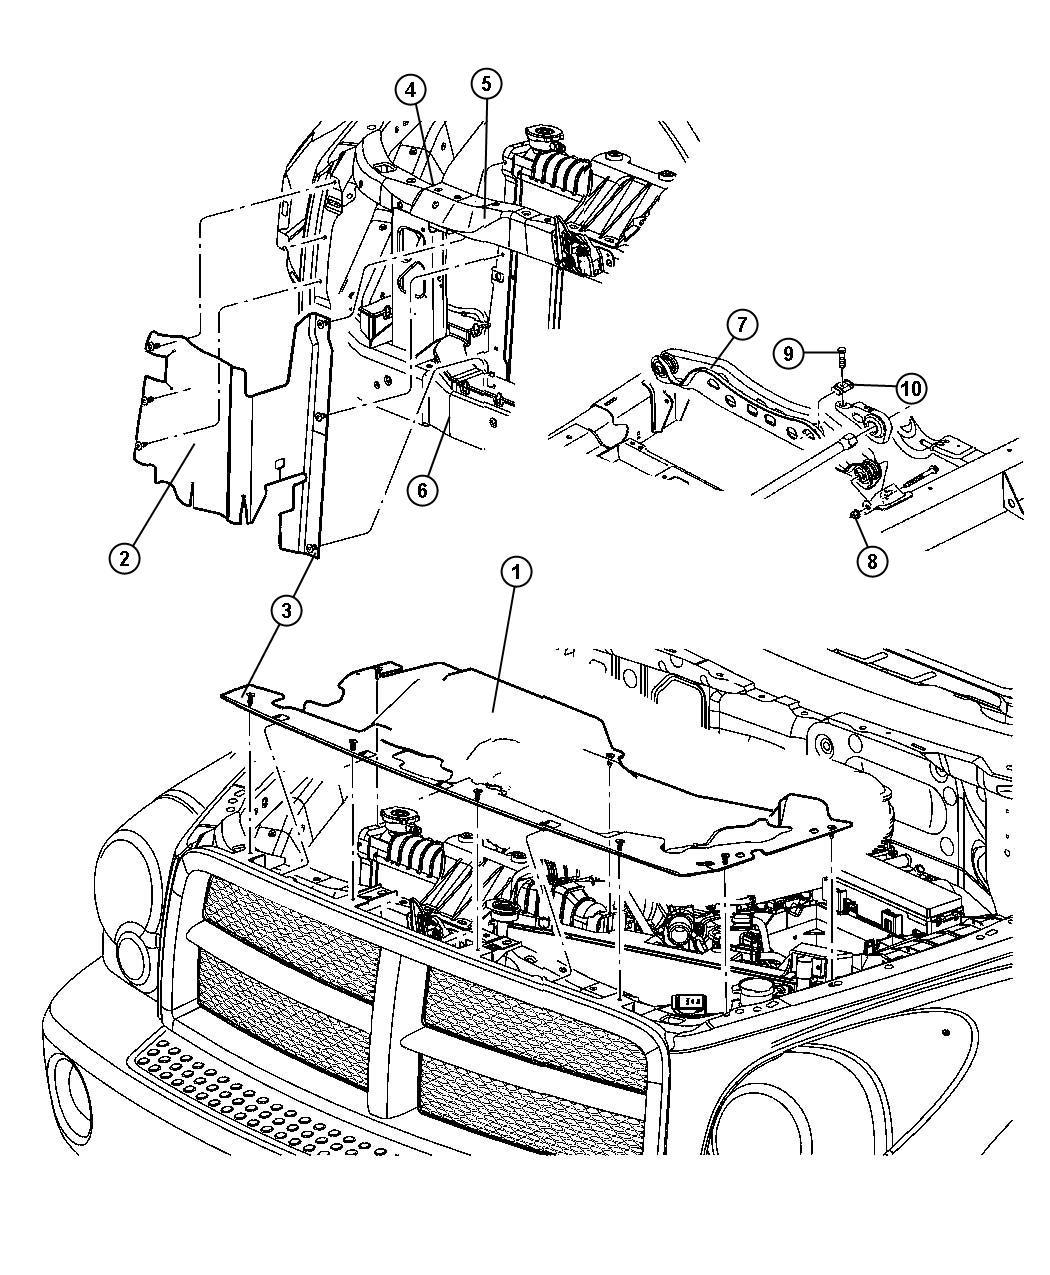 Radiator Closure And Air Deflector